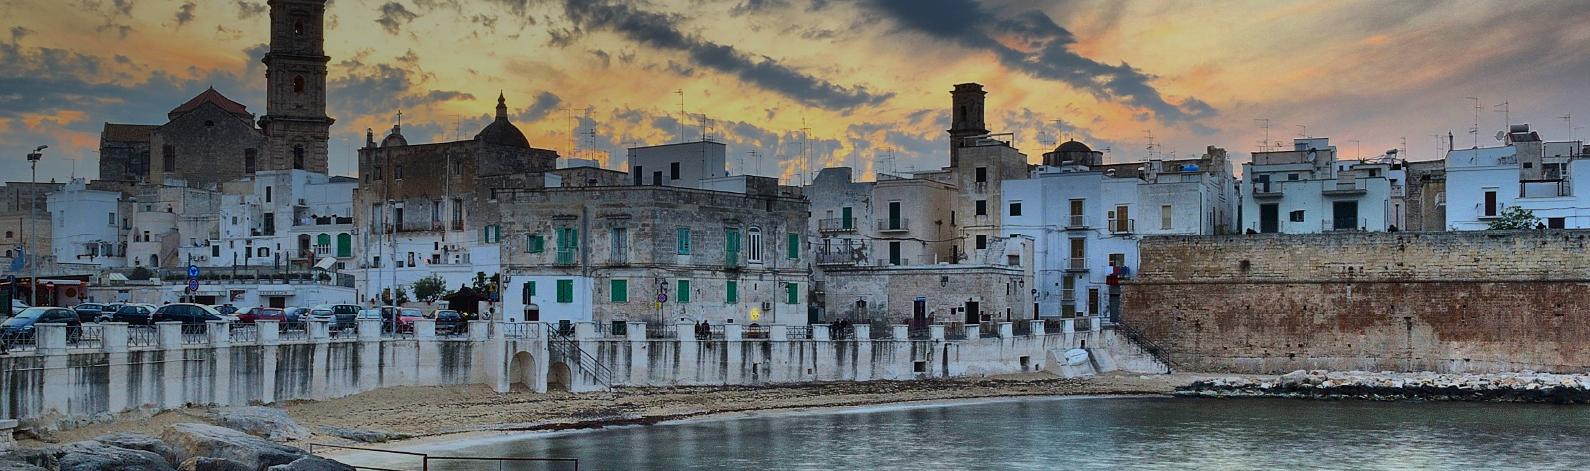 My House in Puglia Locazioni